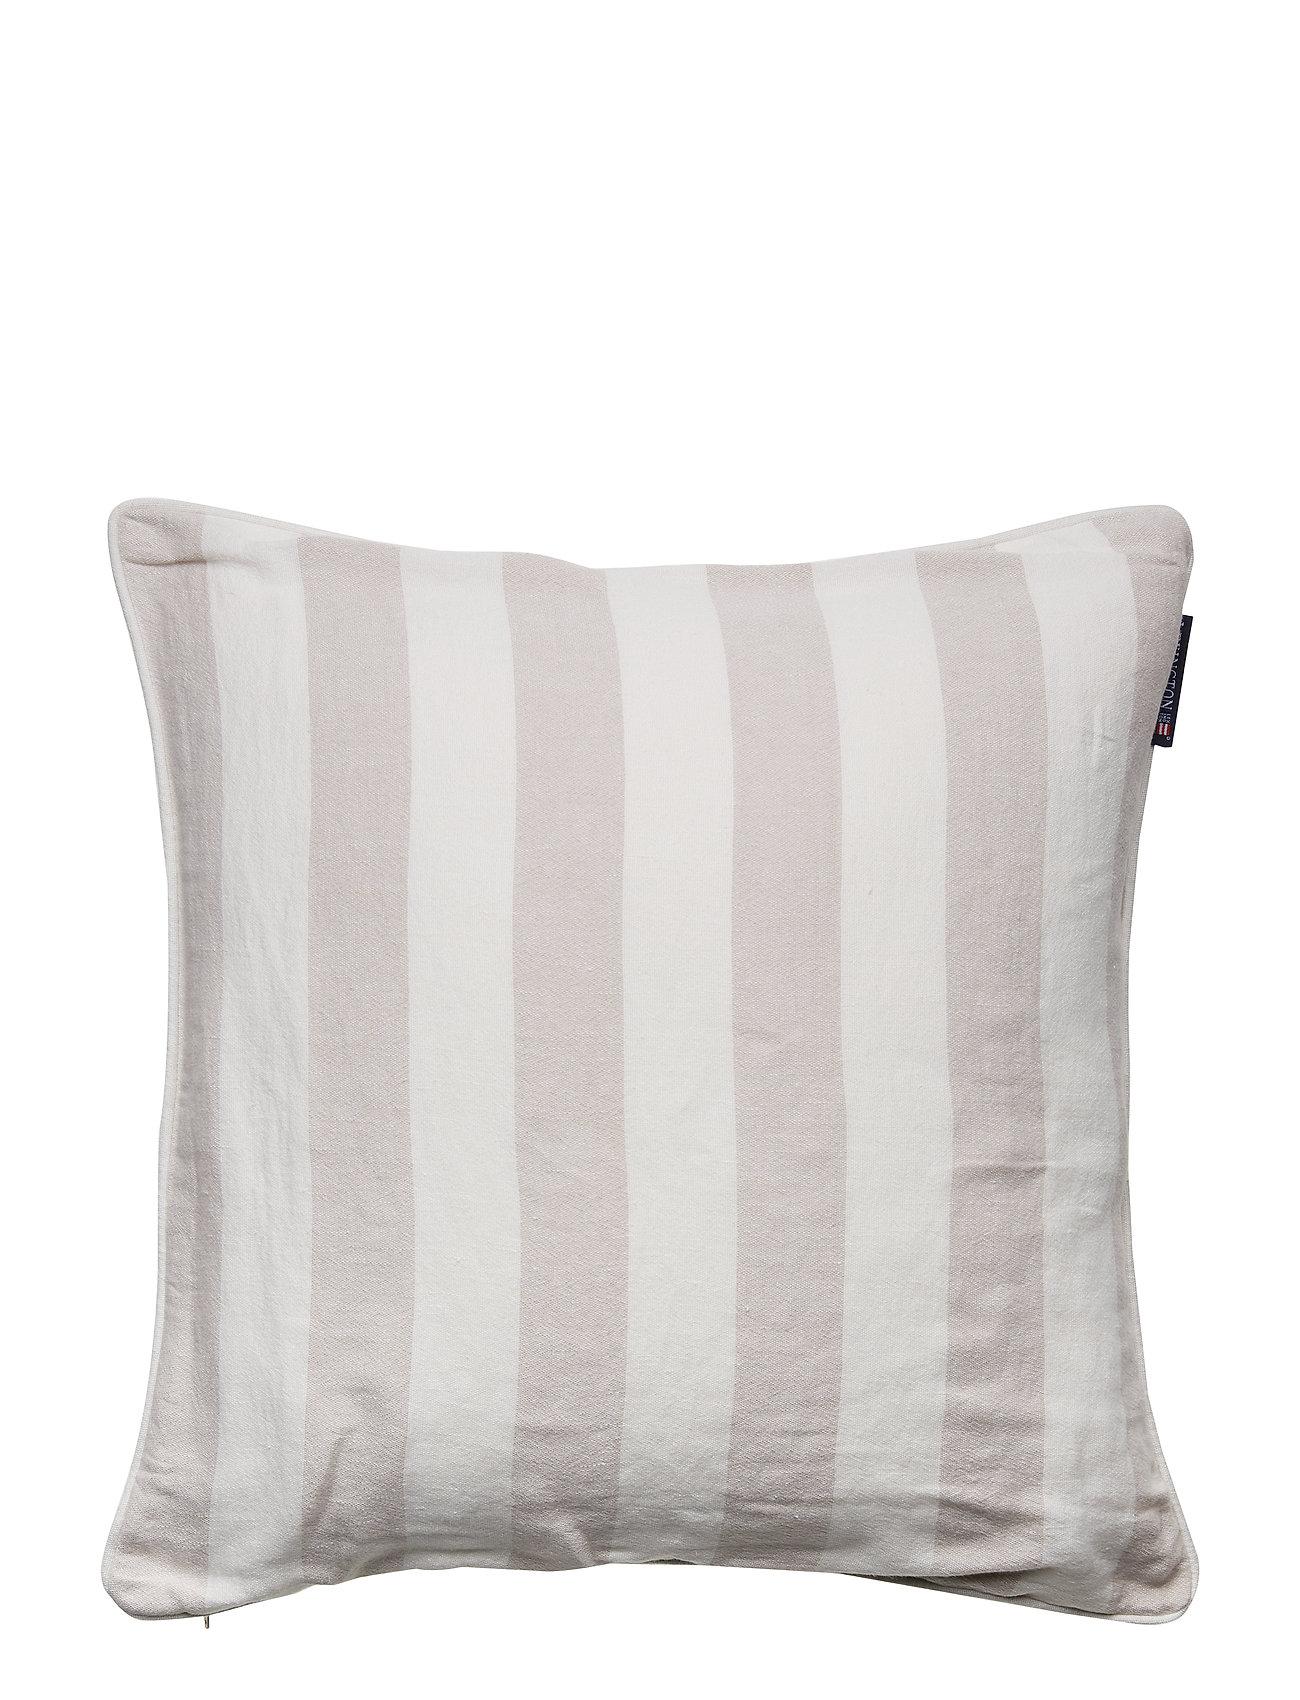 Lexington Home Viscose/Linen Striped Sham - BEIGE/WHITE